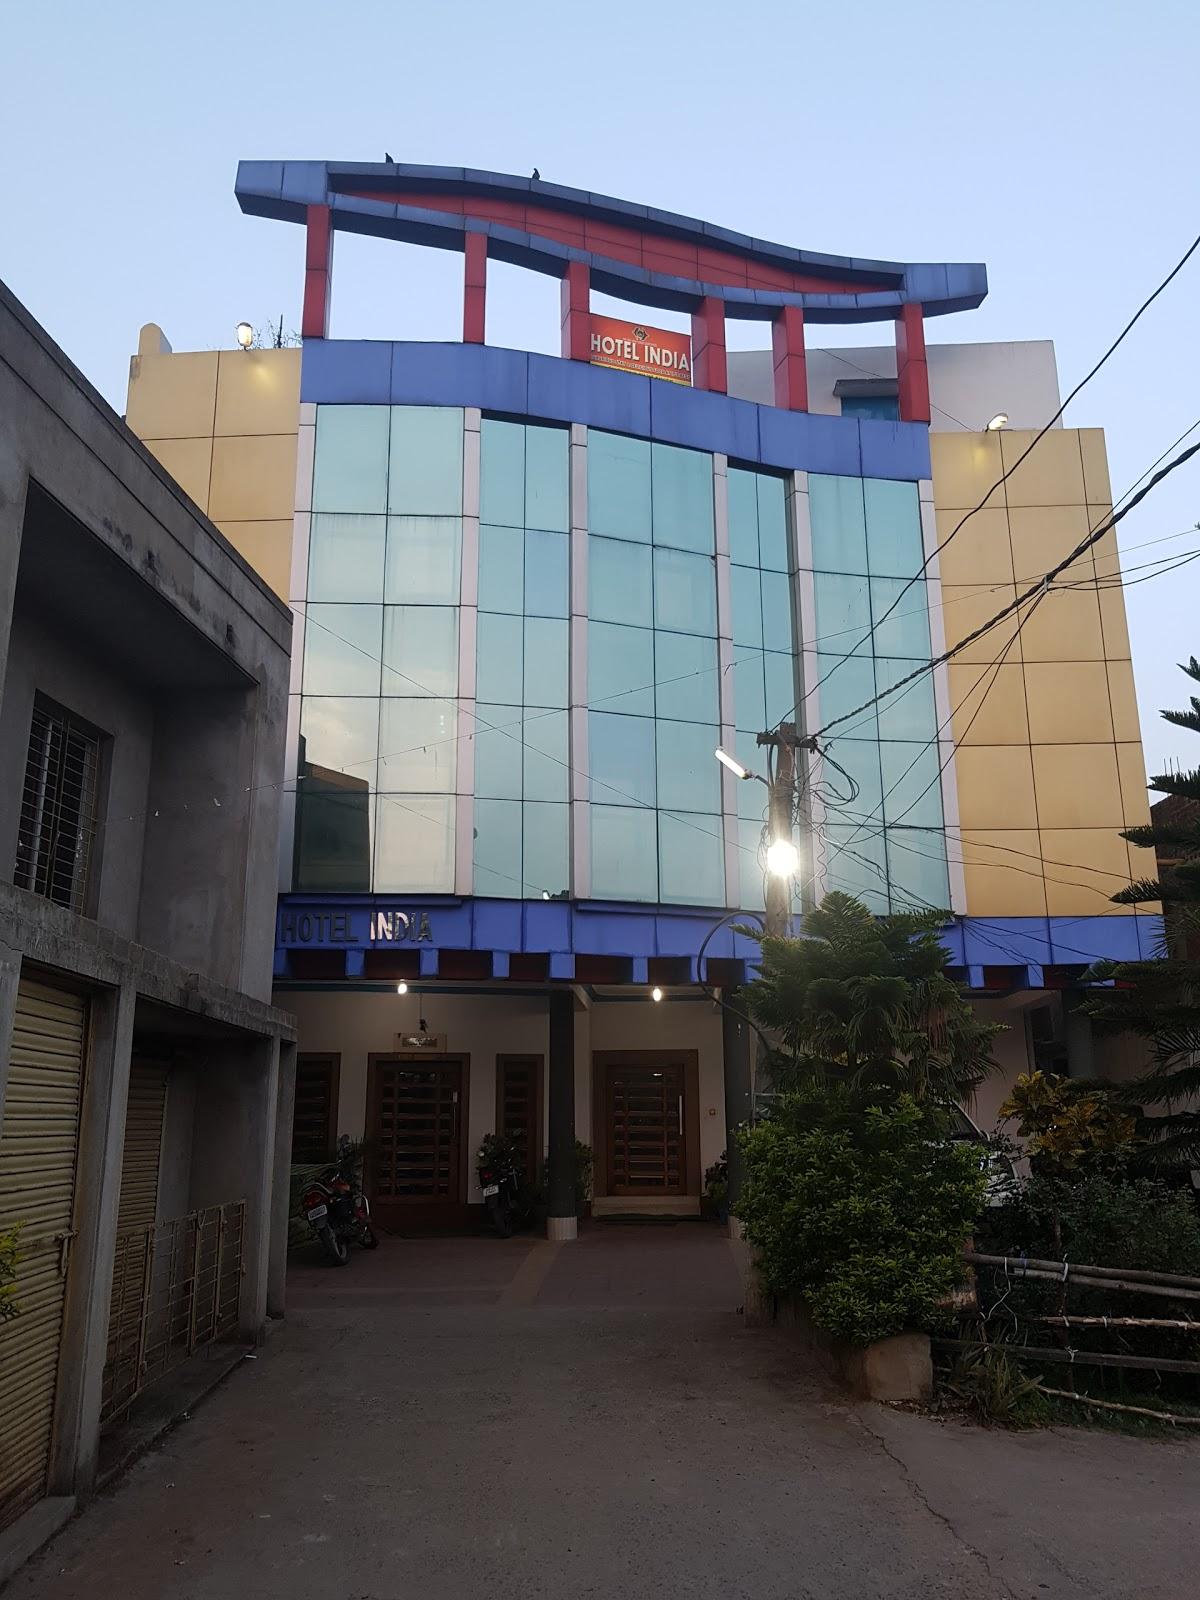 Hotel Kashvi Hotel Shree Krishna Keonjhar Orissa Around Guides